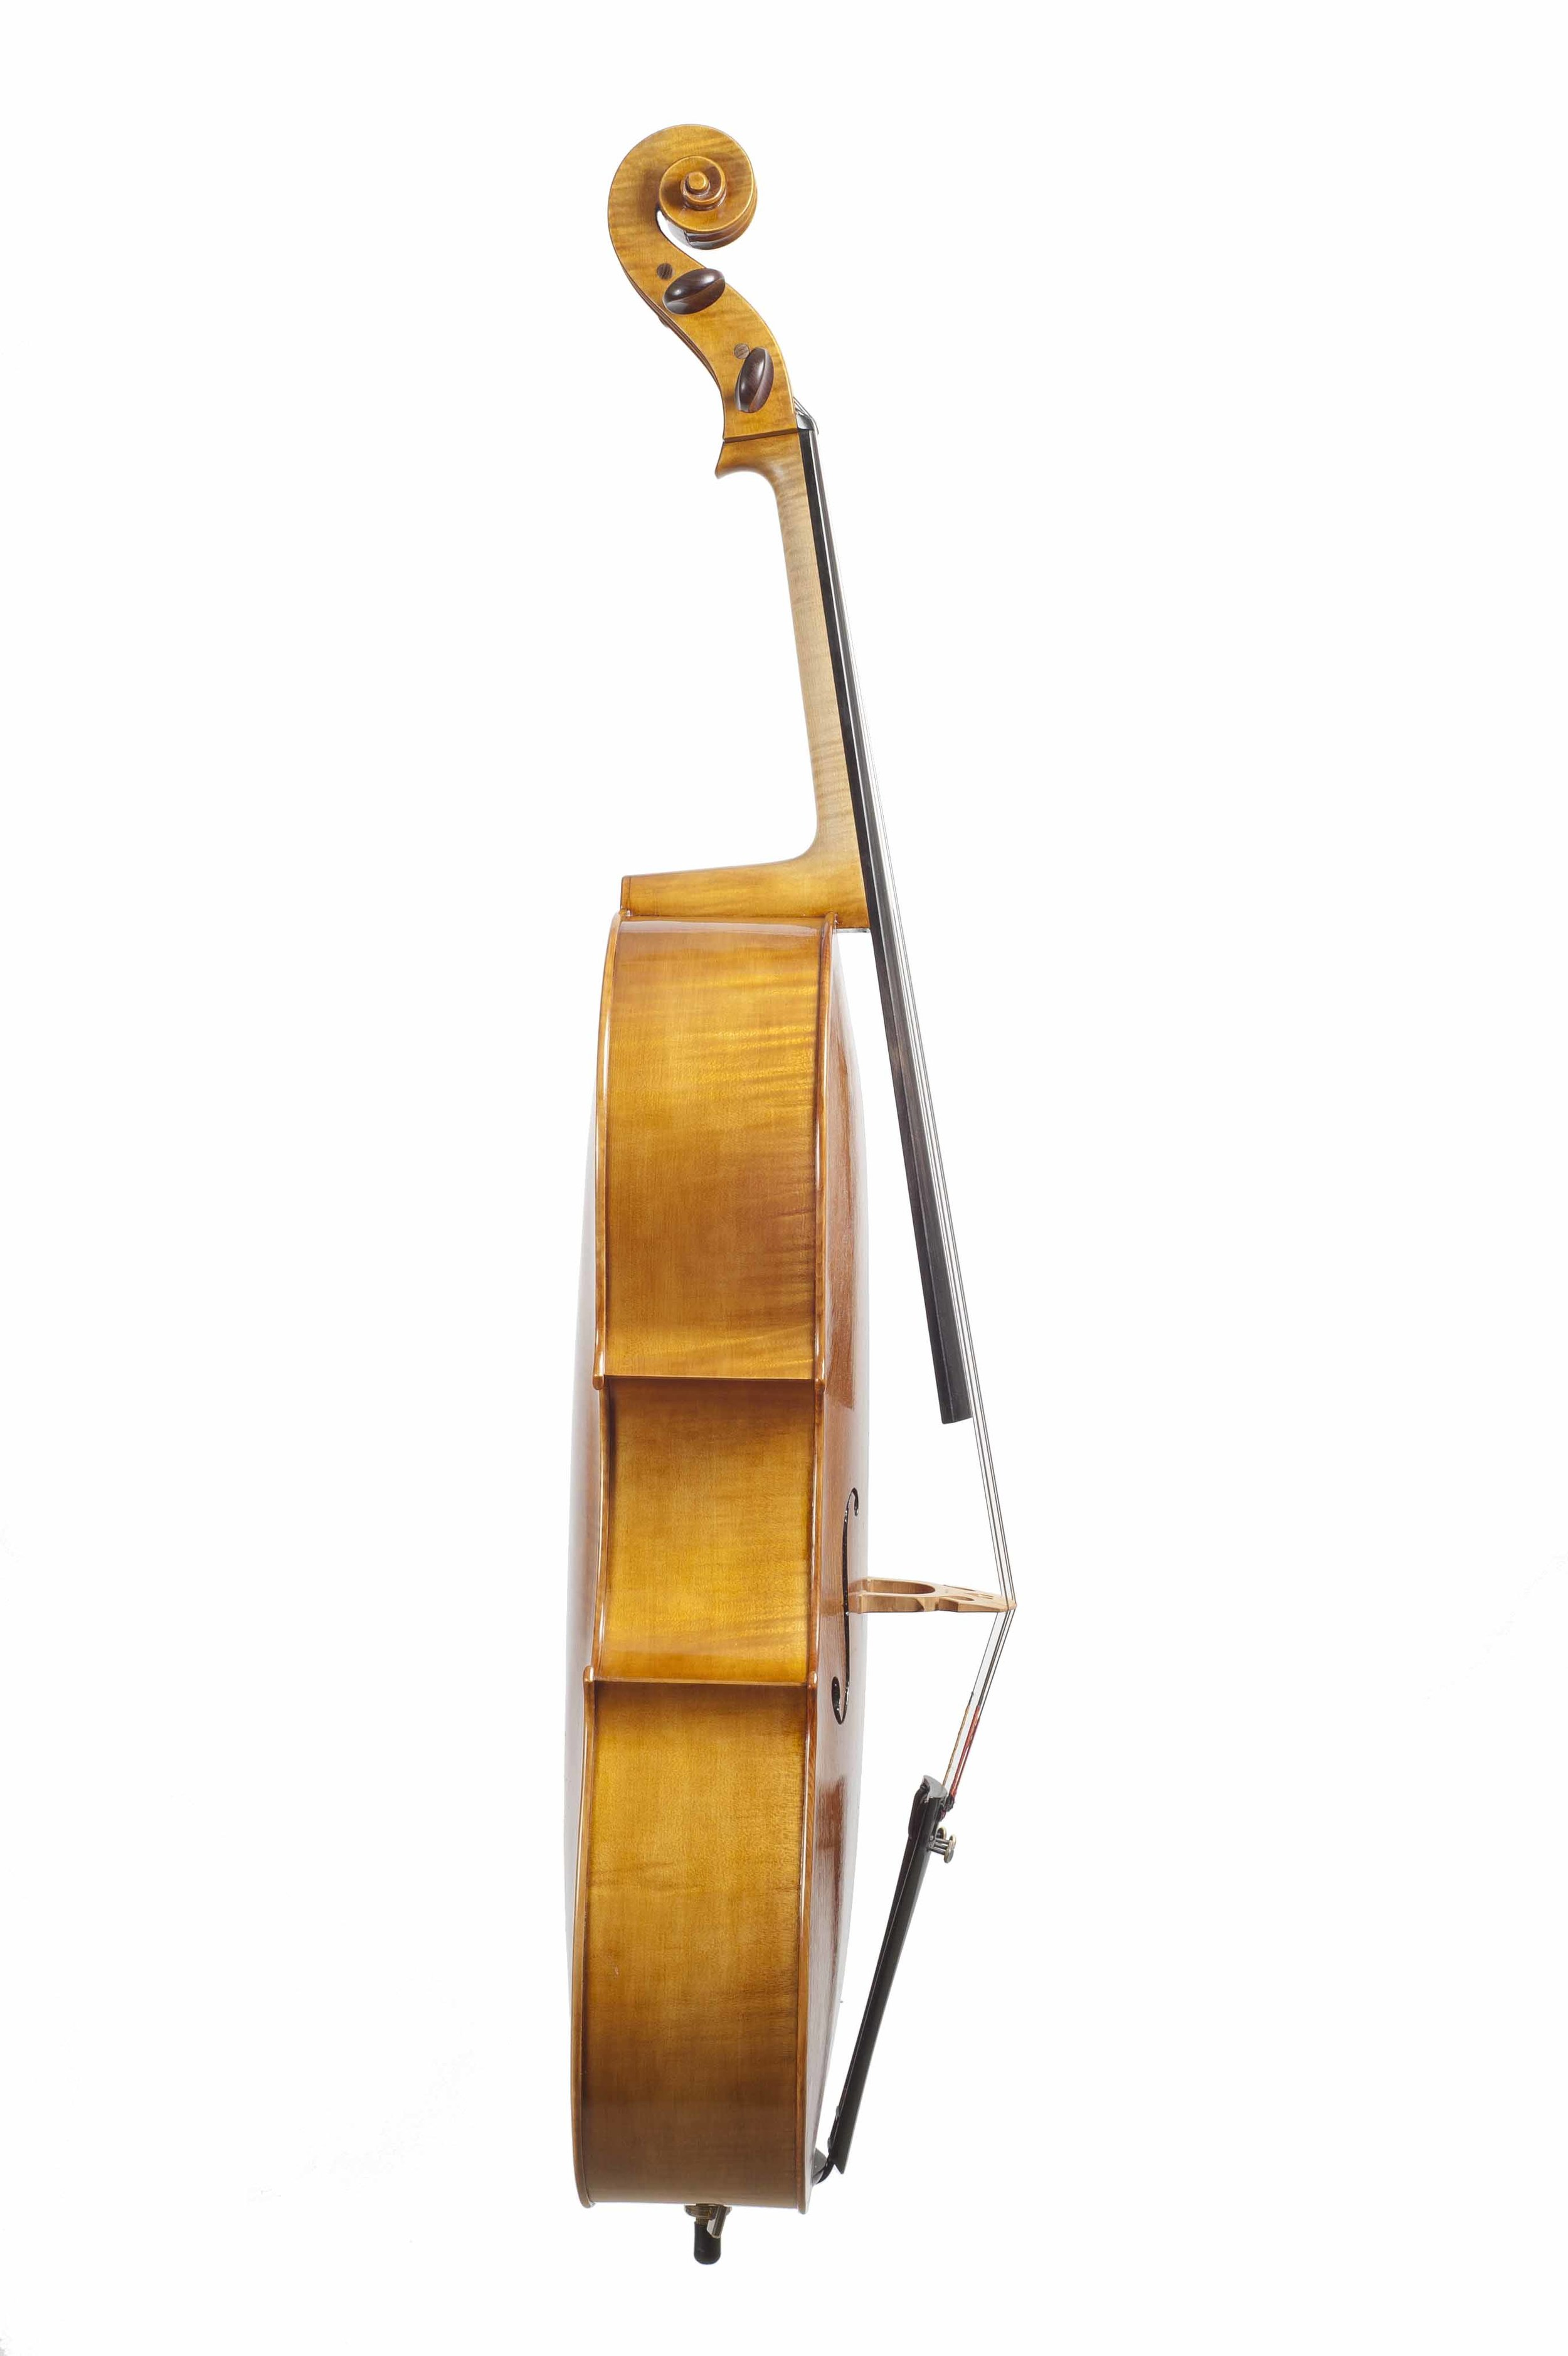 23 Cello Strad 1726 Side.jpg